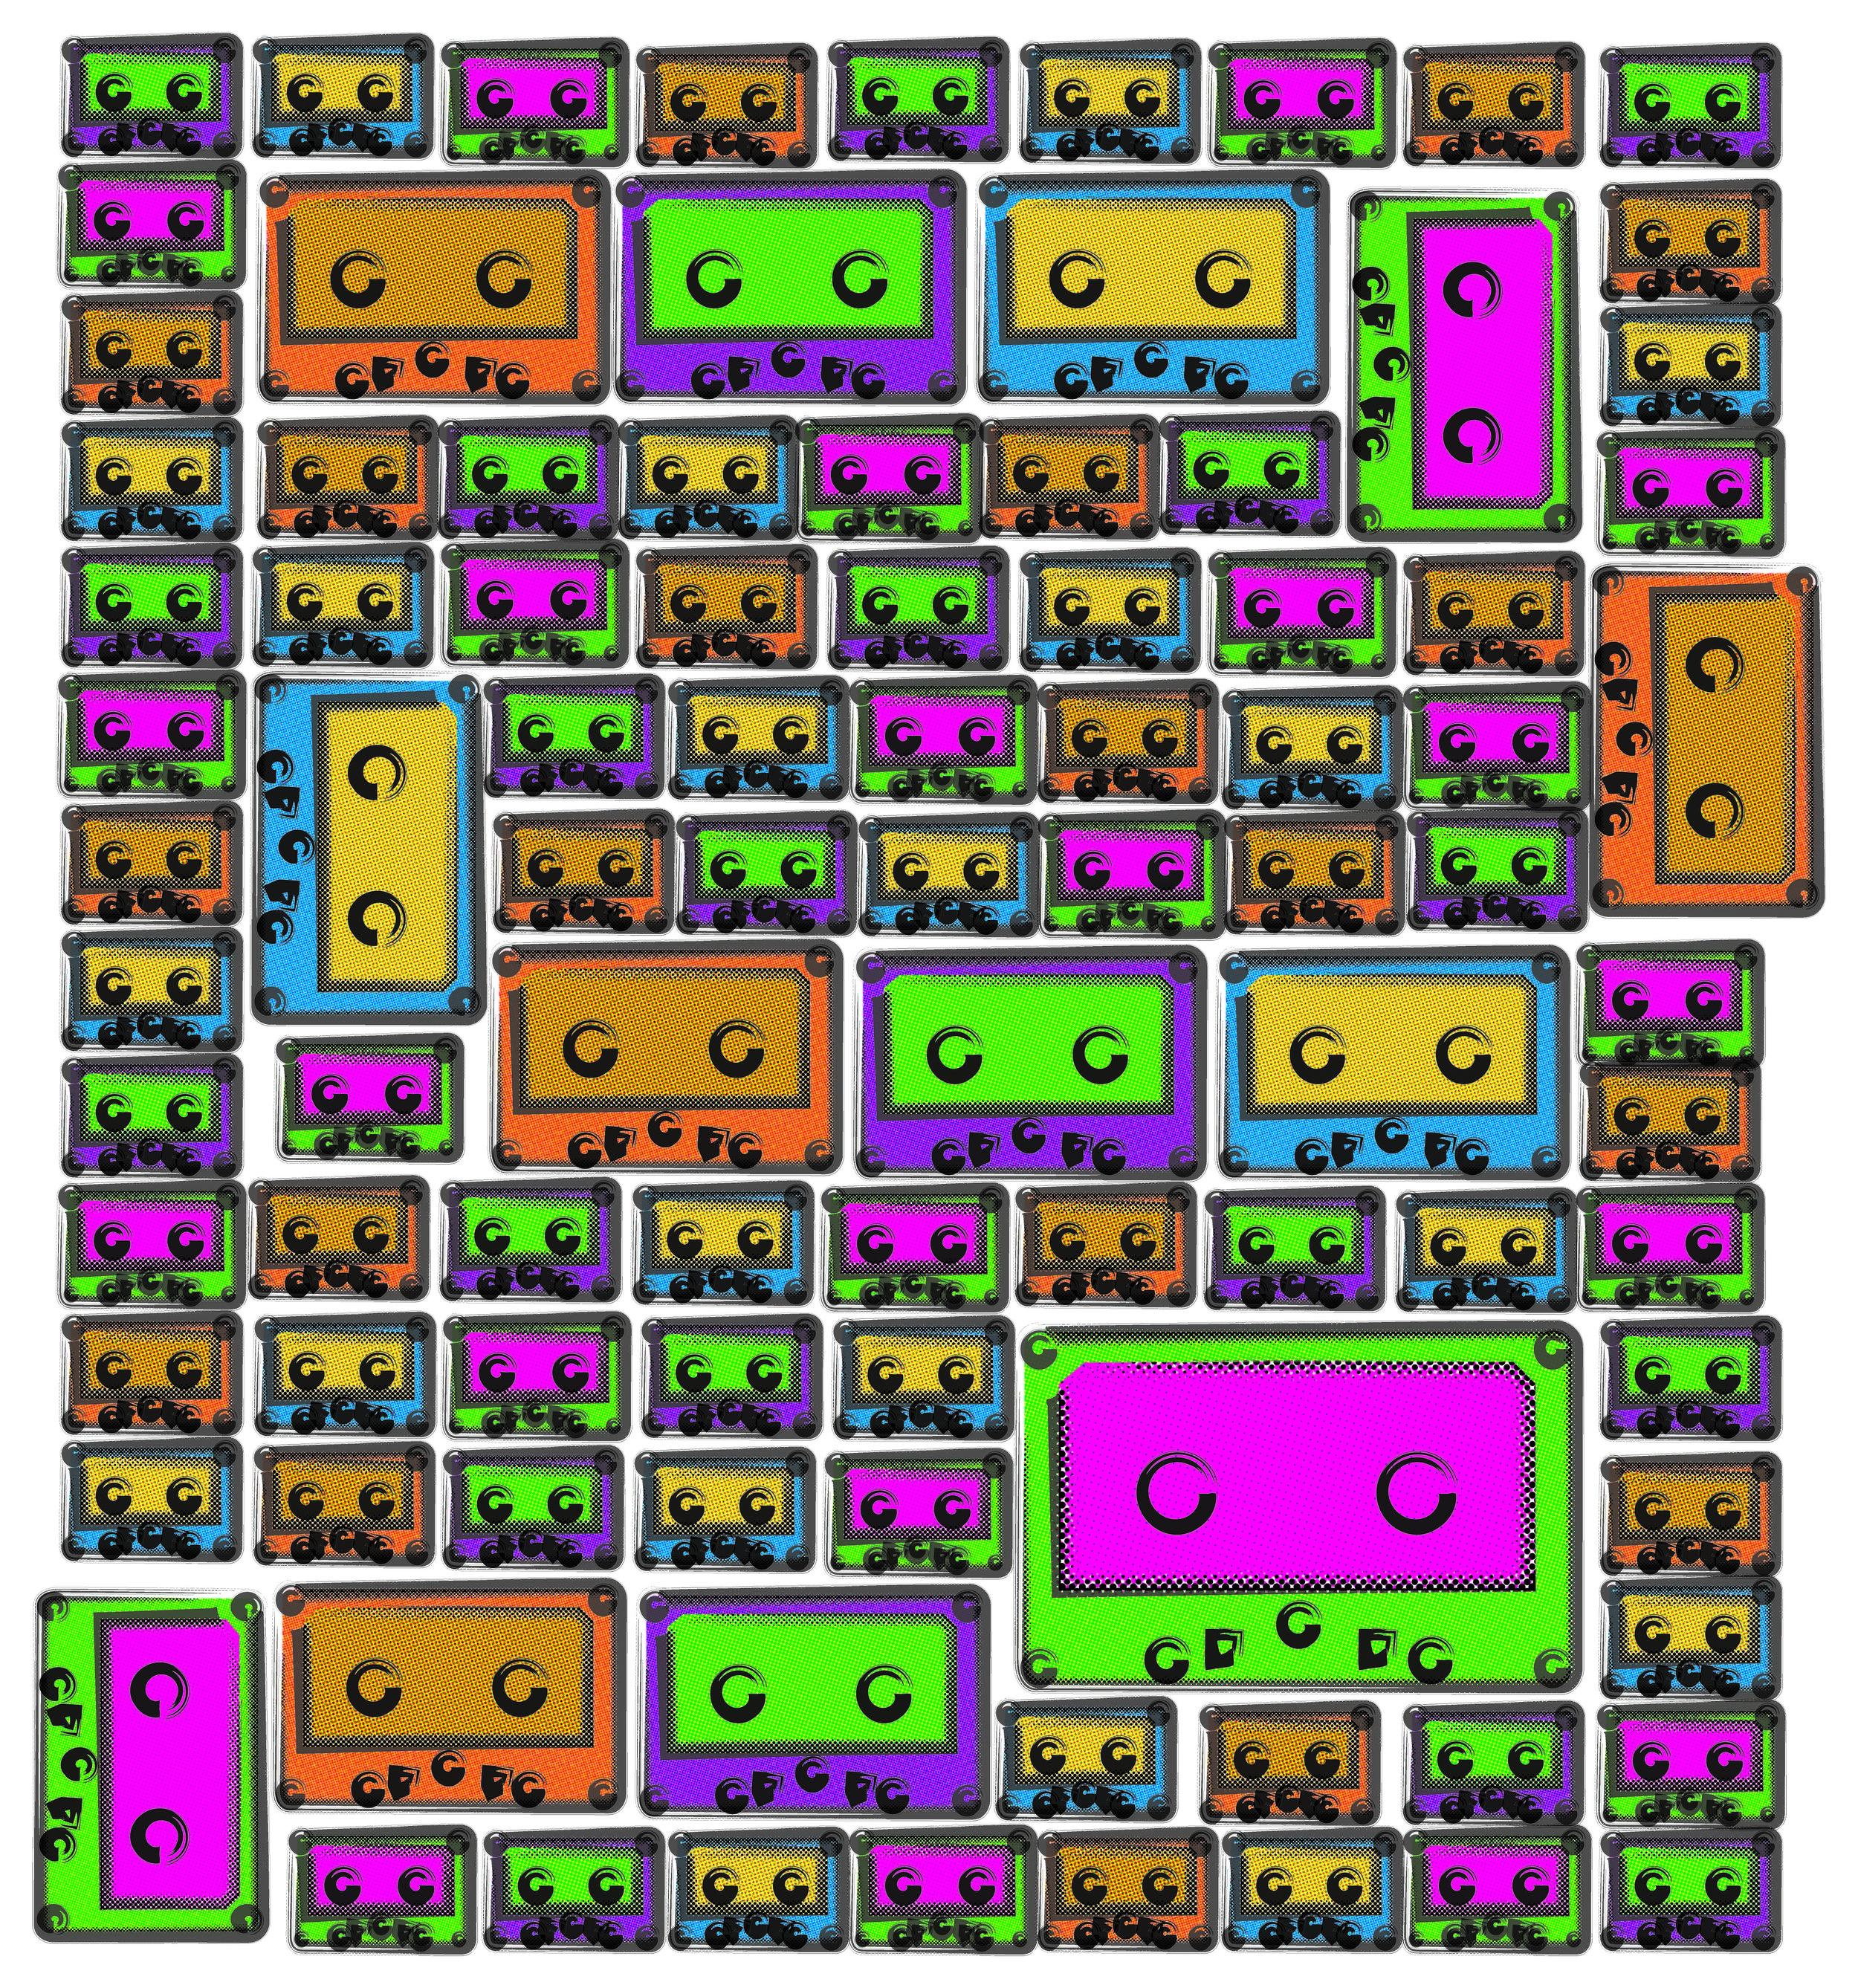 CS_LightBox Top.jpg